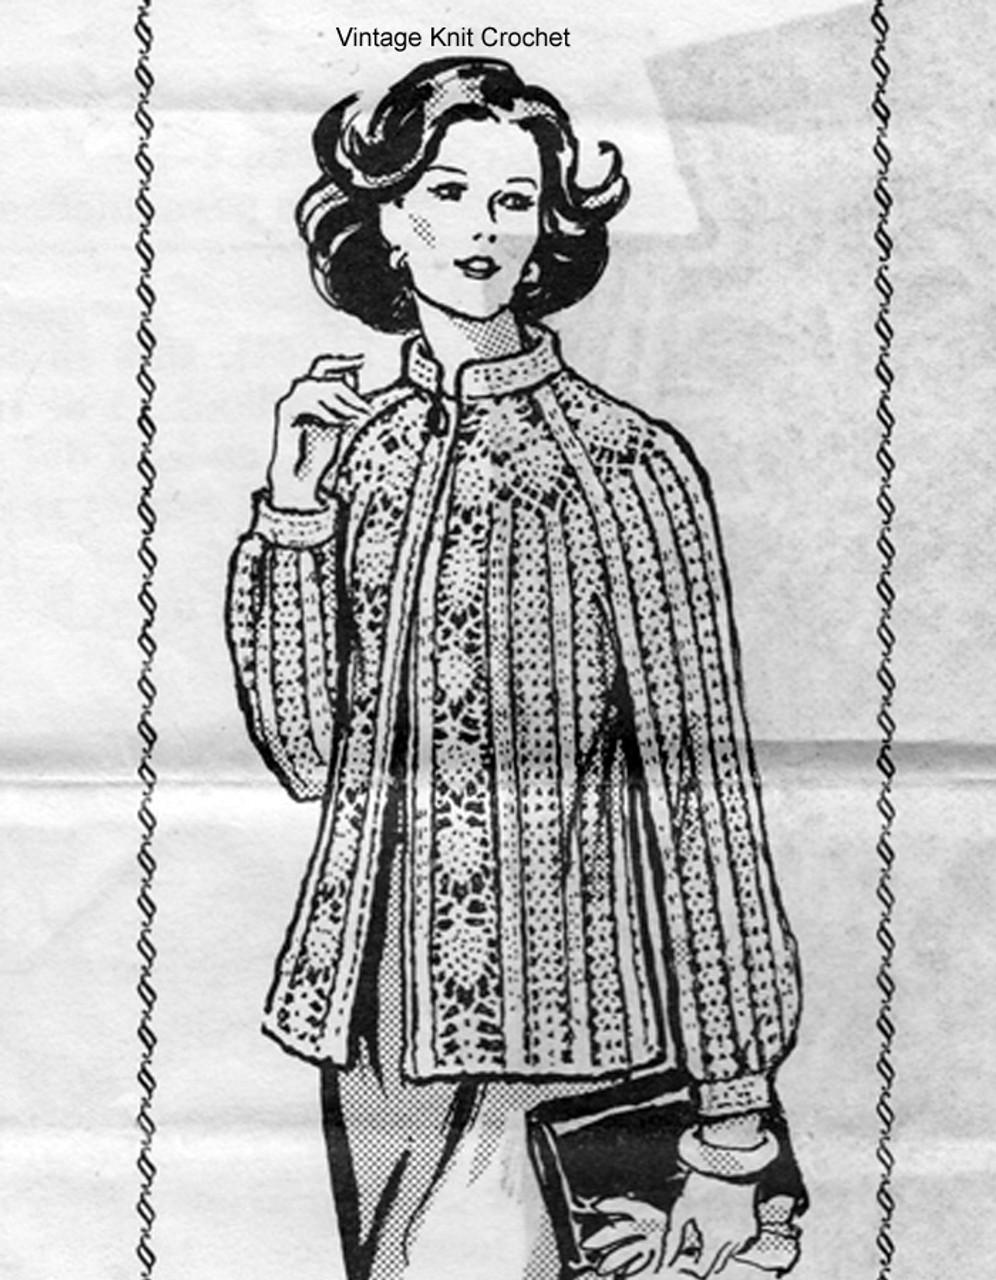 Mail Order Pineapple Crocheted Jacket Pattern, Laura Wheeler 7327